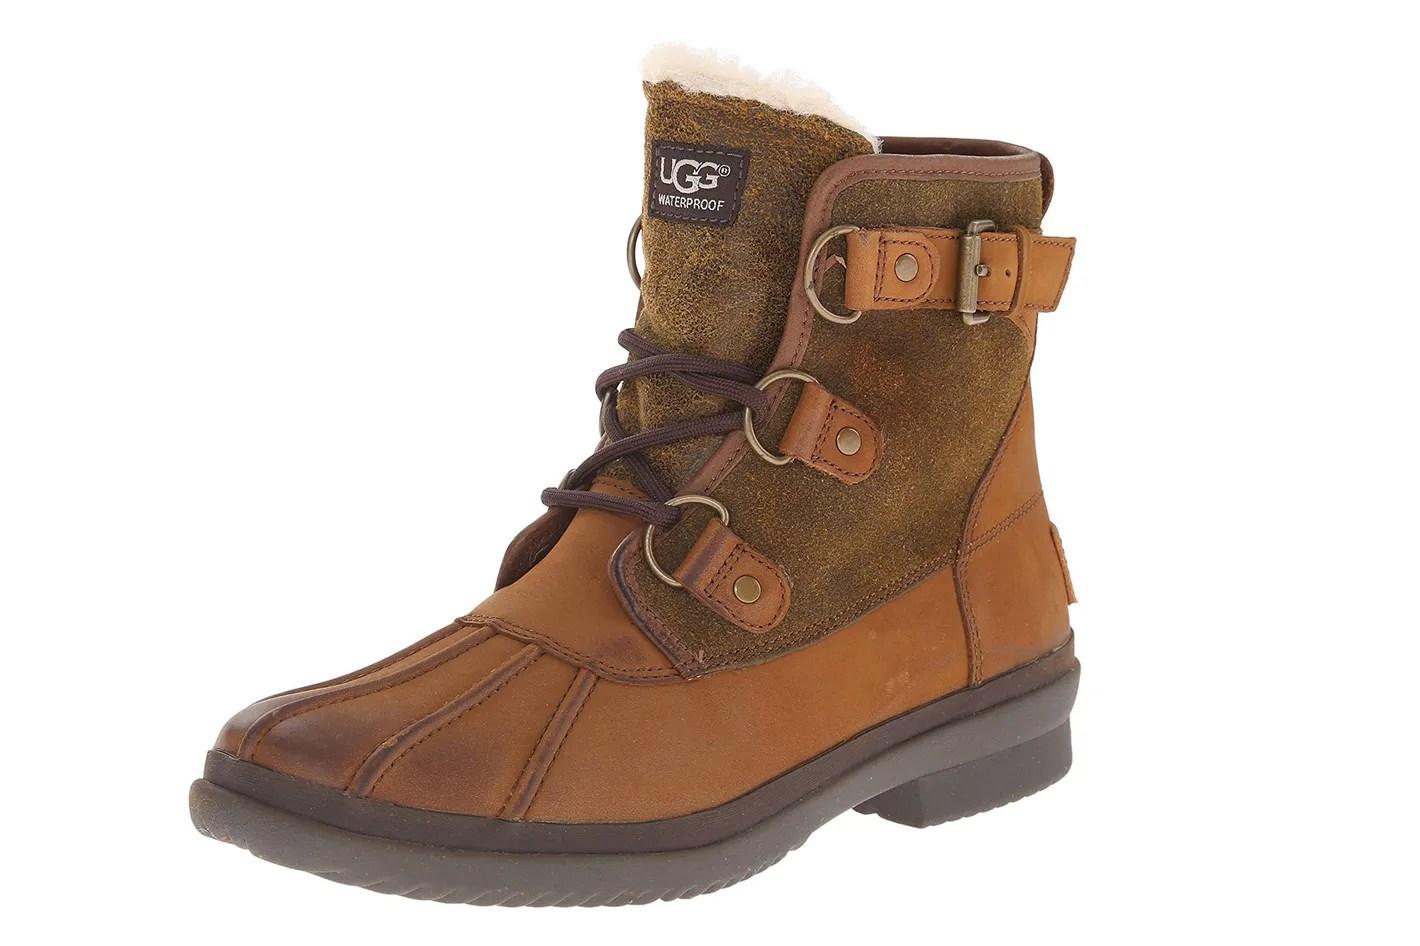 Best Winter Boots For Women 2018